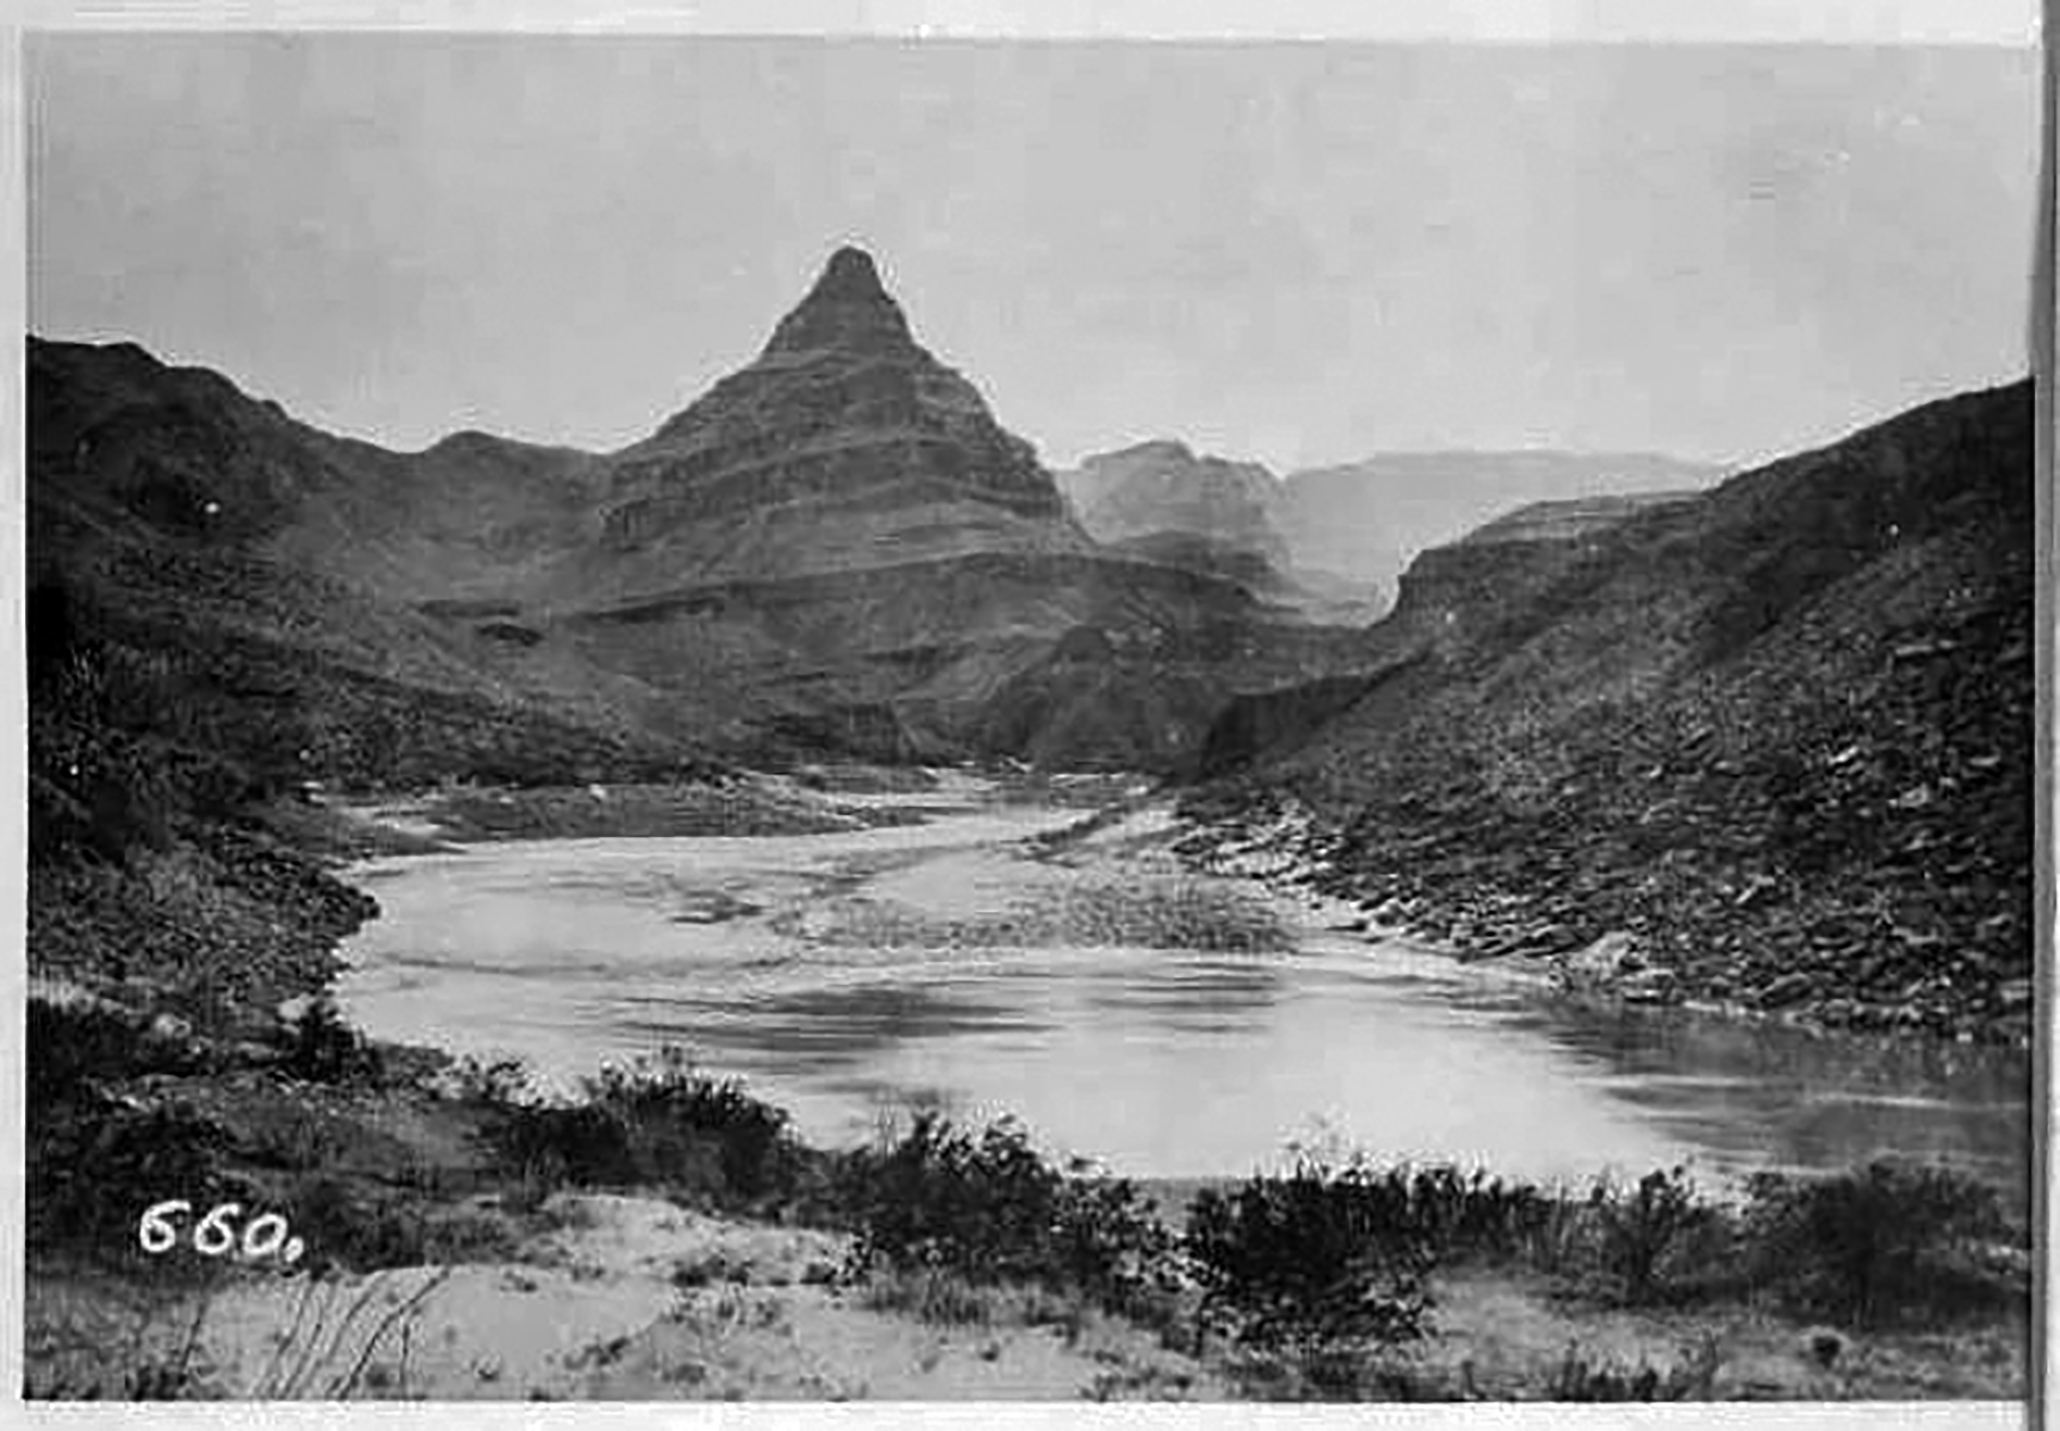 Click image for larger version  Name:Diamond Peak 1890.JPG Views:83 Size:775.3 KB ID:11063